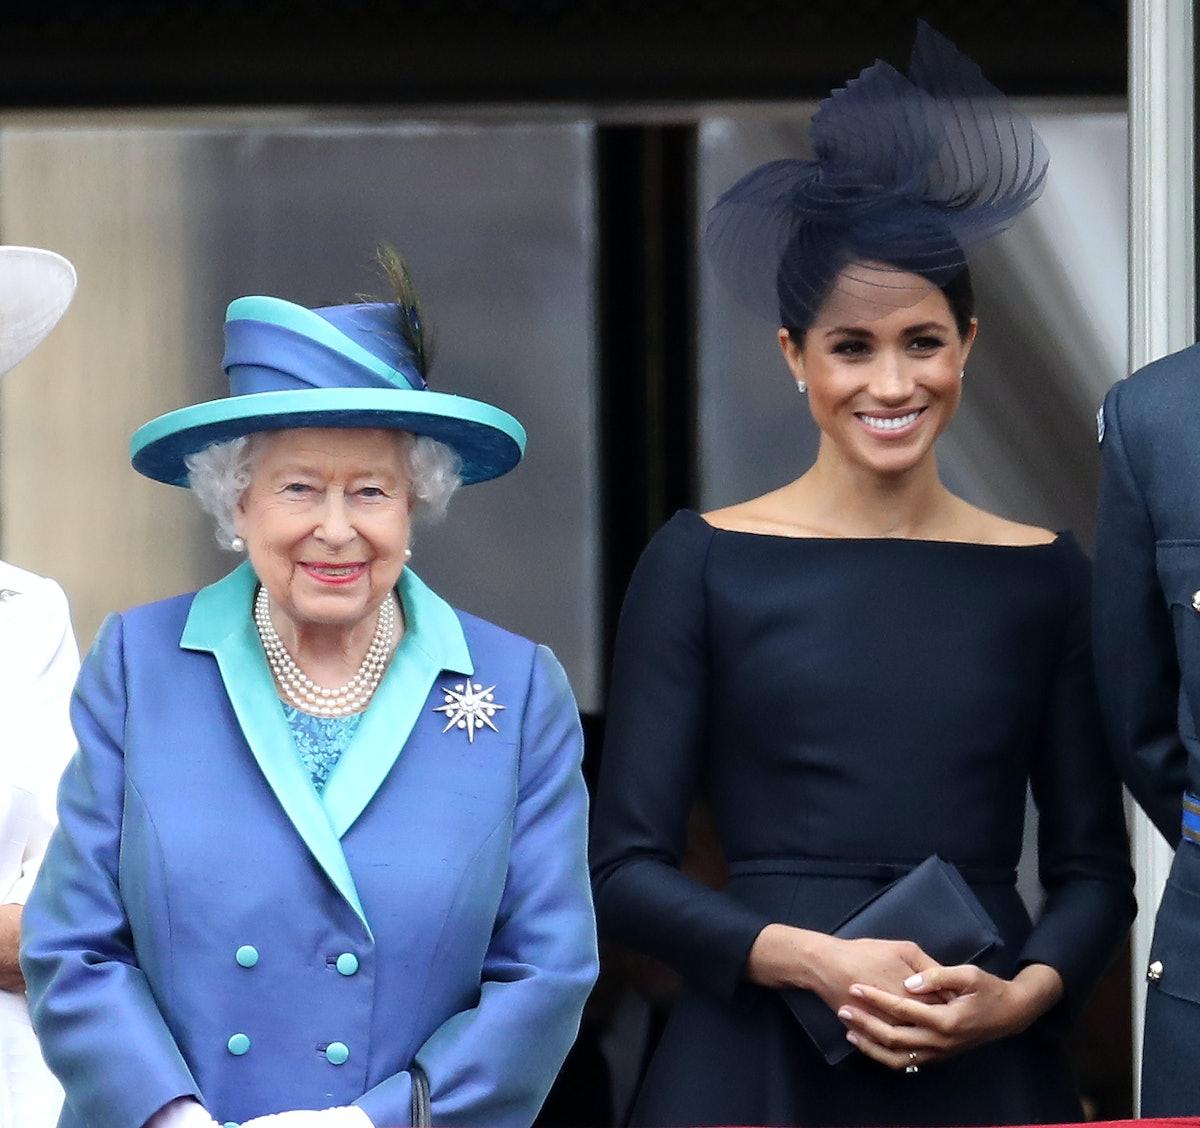 LONDON, ENGLAND - JULY 10: Queen Elizabeth II and Meghan, Duchess of Sussex on the balcony of Buckin...